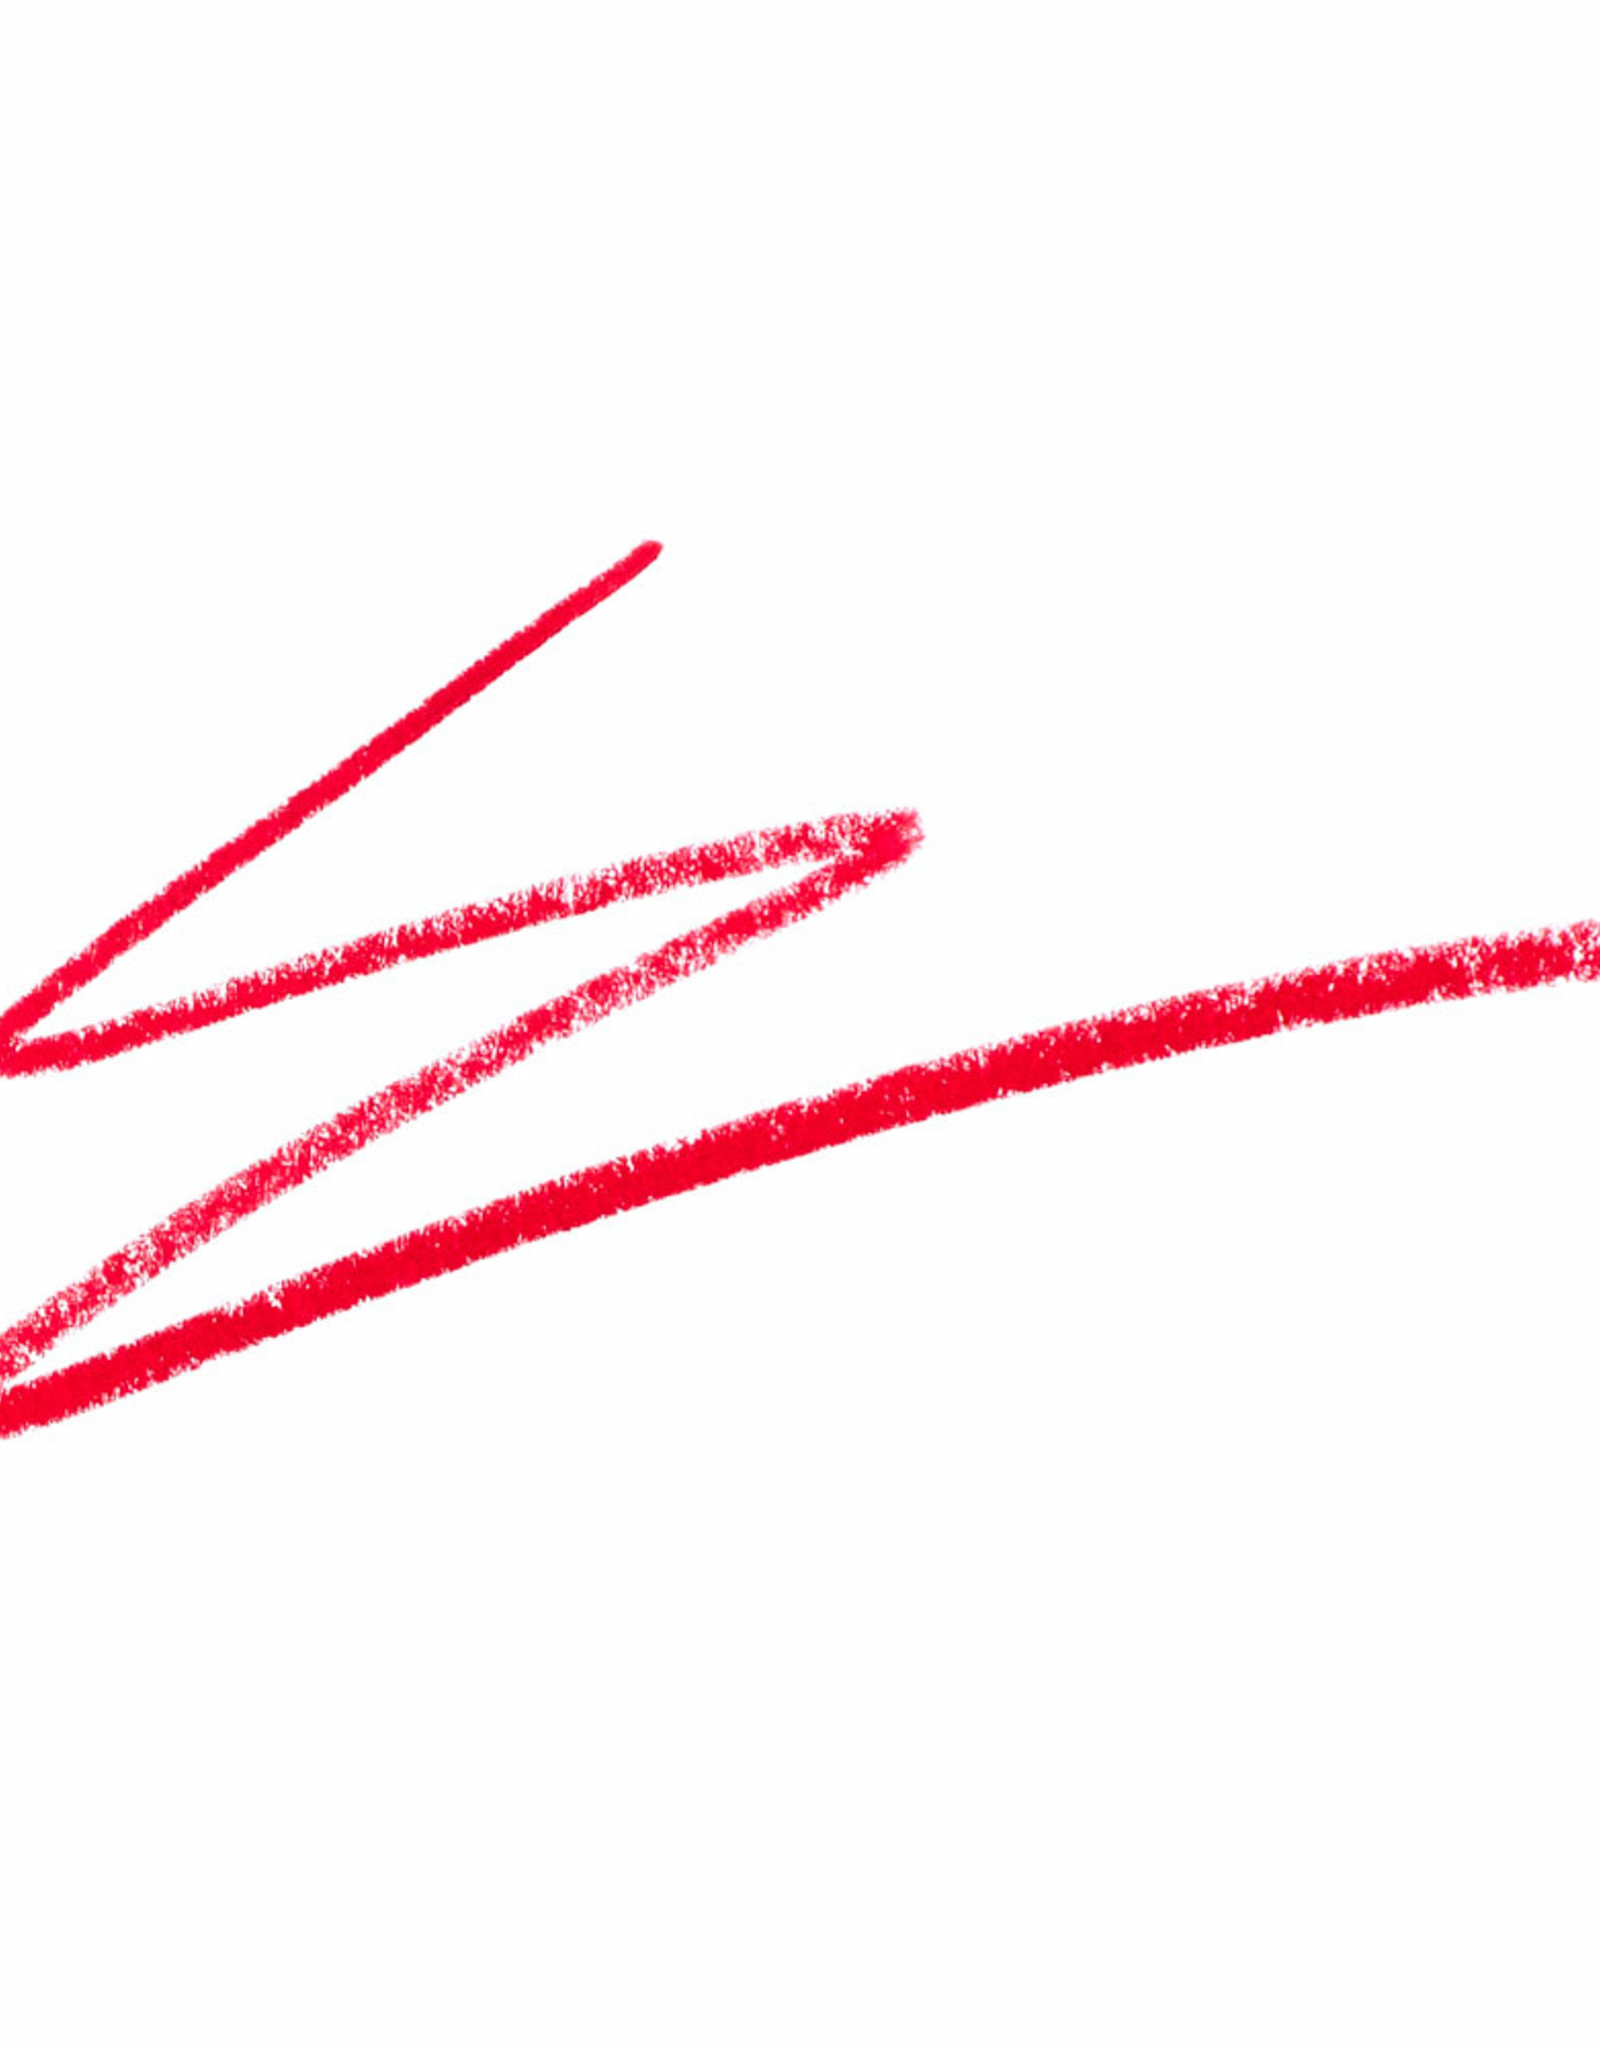 Ben Nye LIP COLOR PENCIL, CHERRY POP,.065 OZ